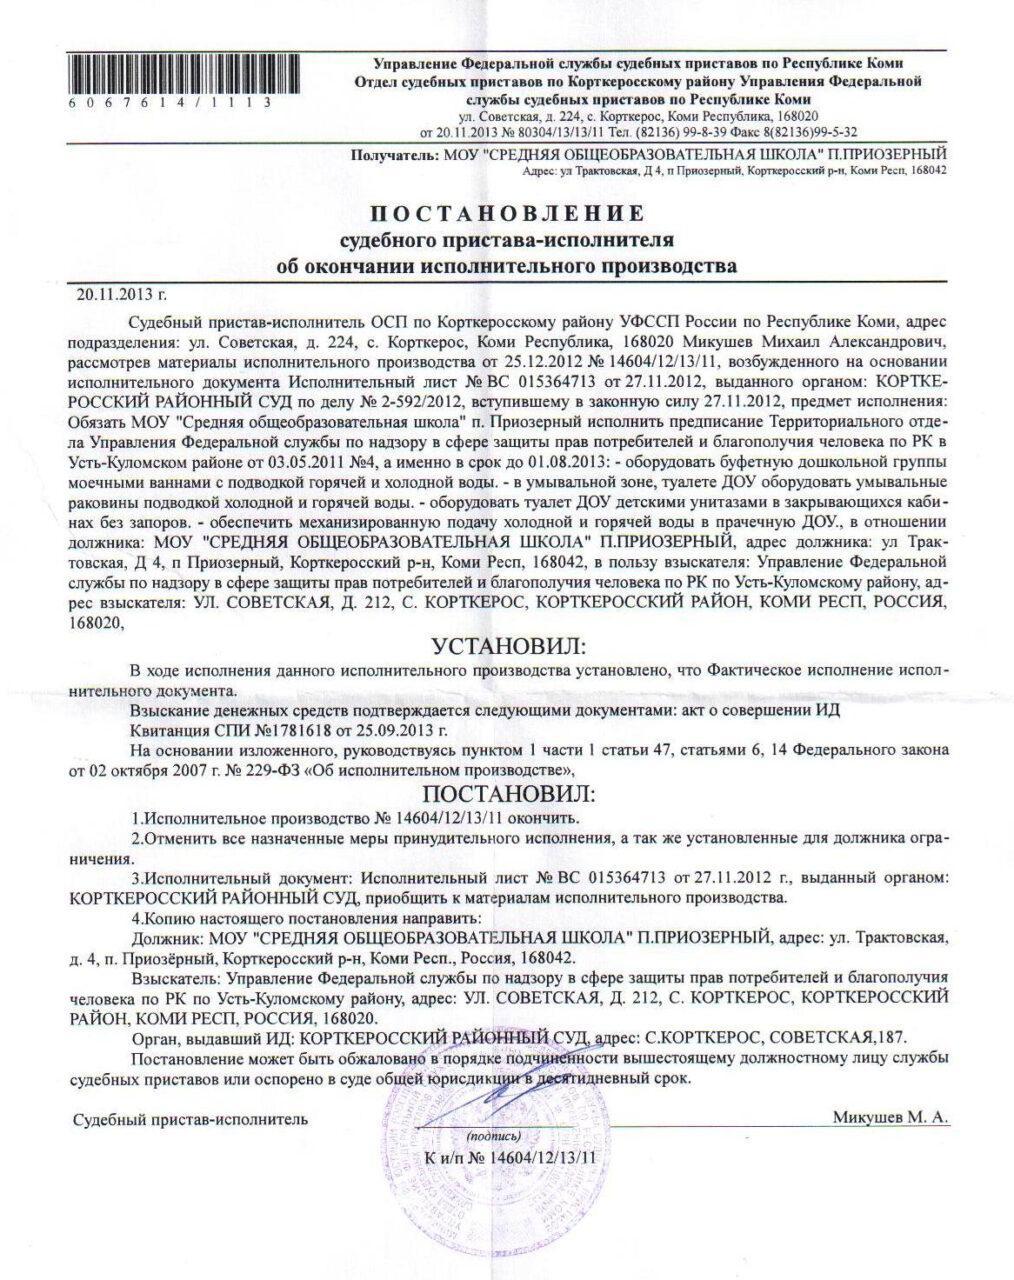 https://priozernyschool.3dn.ru/dokumenti/pismo_004.jpg